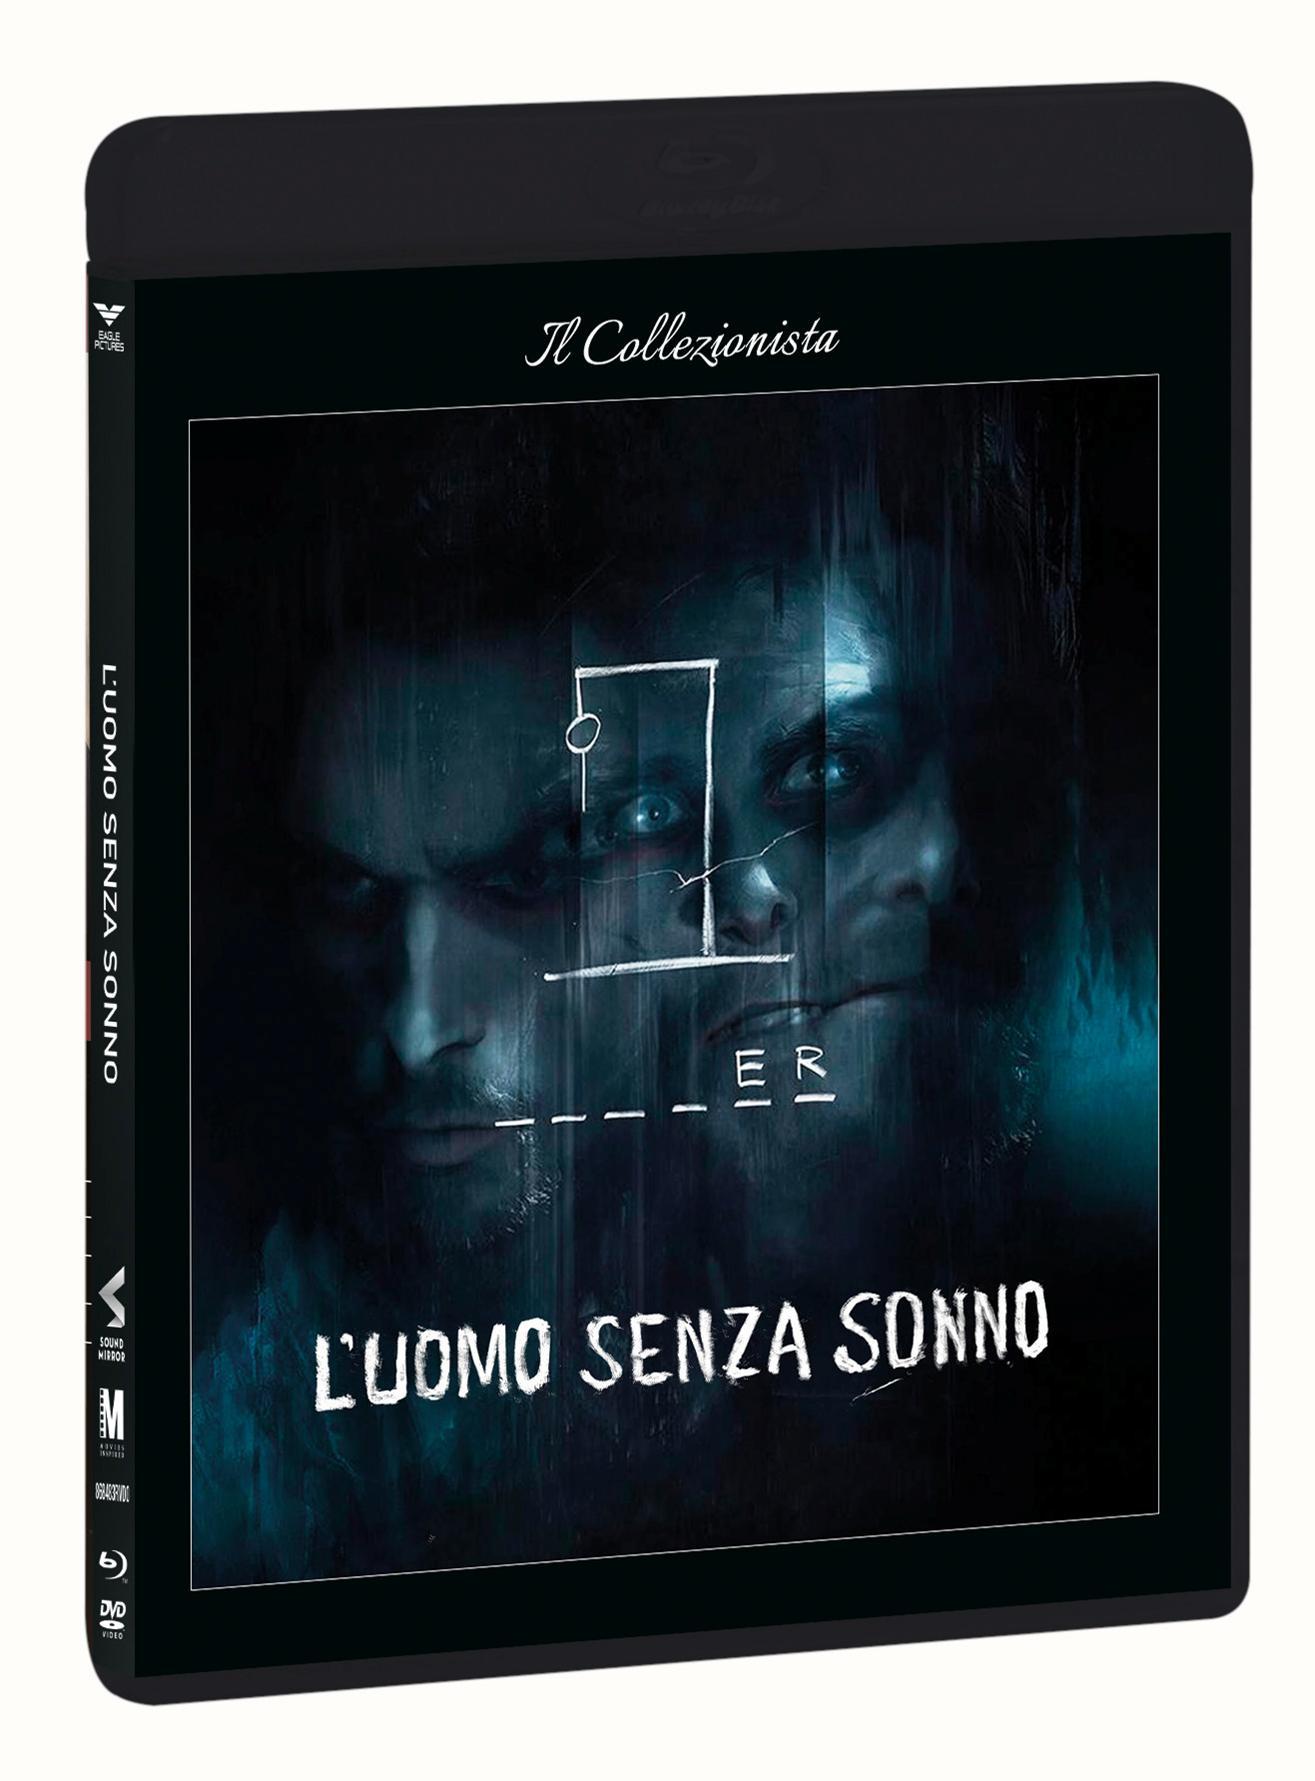 L'UOMO SENZA SONNO (BLU-RAY+DVD)